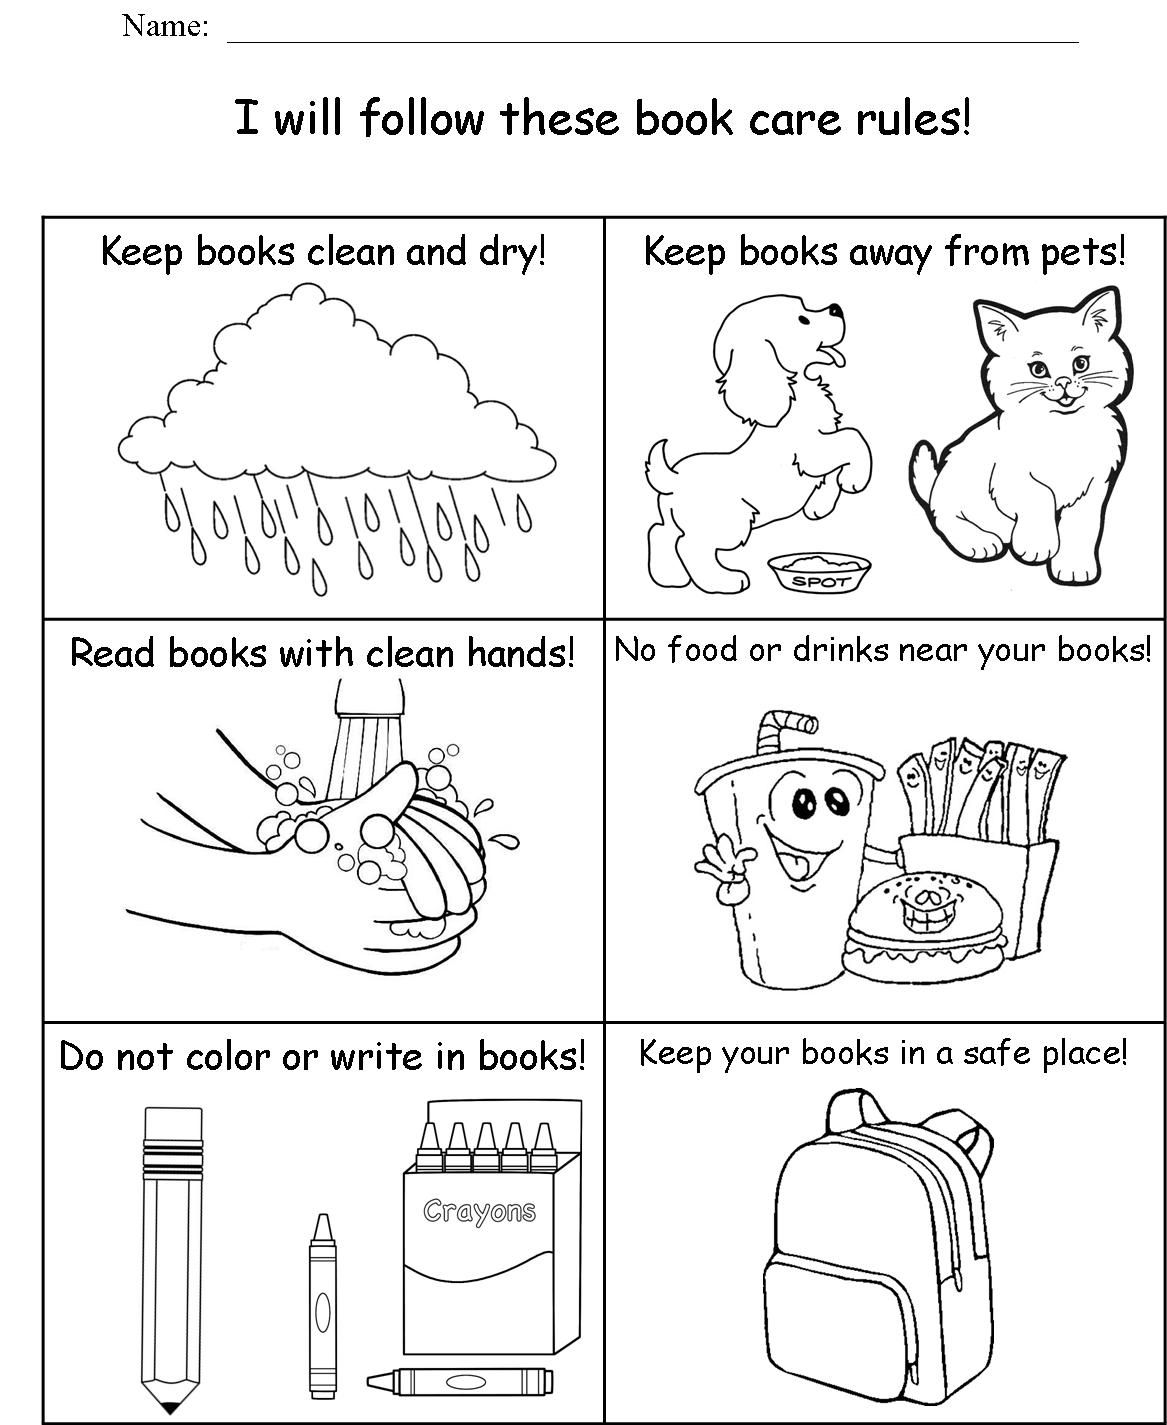 Worksheets Library Skills Worksheets rilink schools edgewood highland school library kindergarten worksheets kindergarten